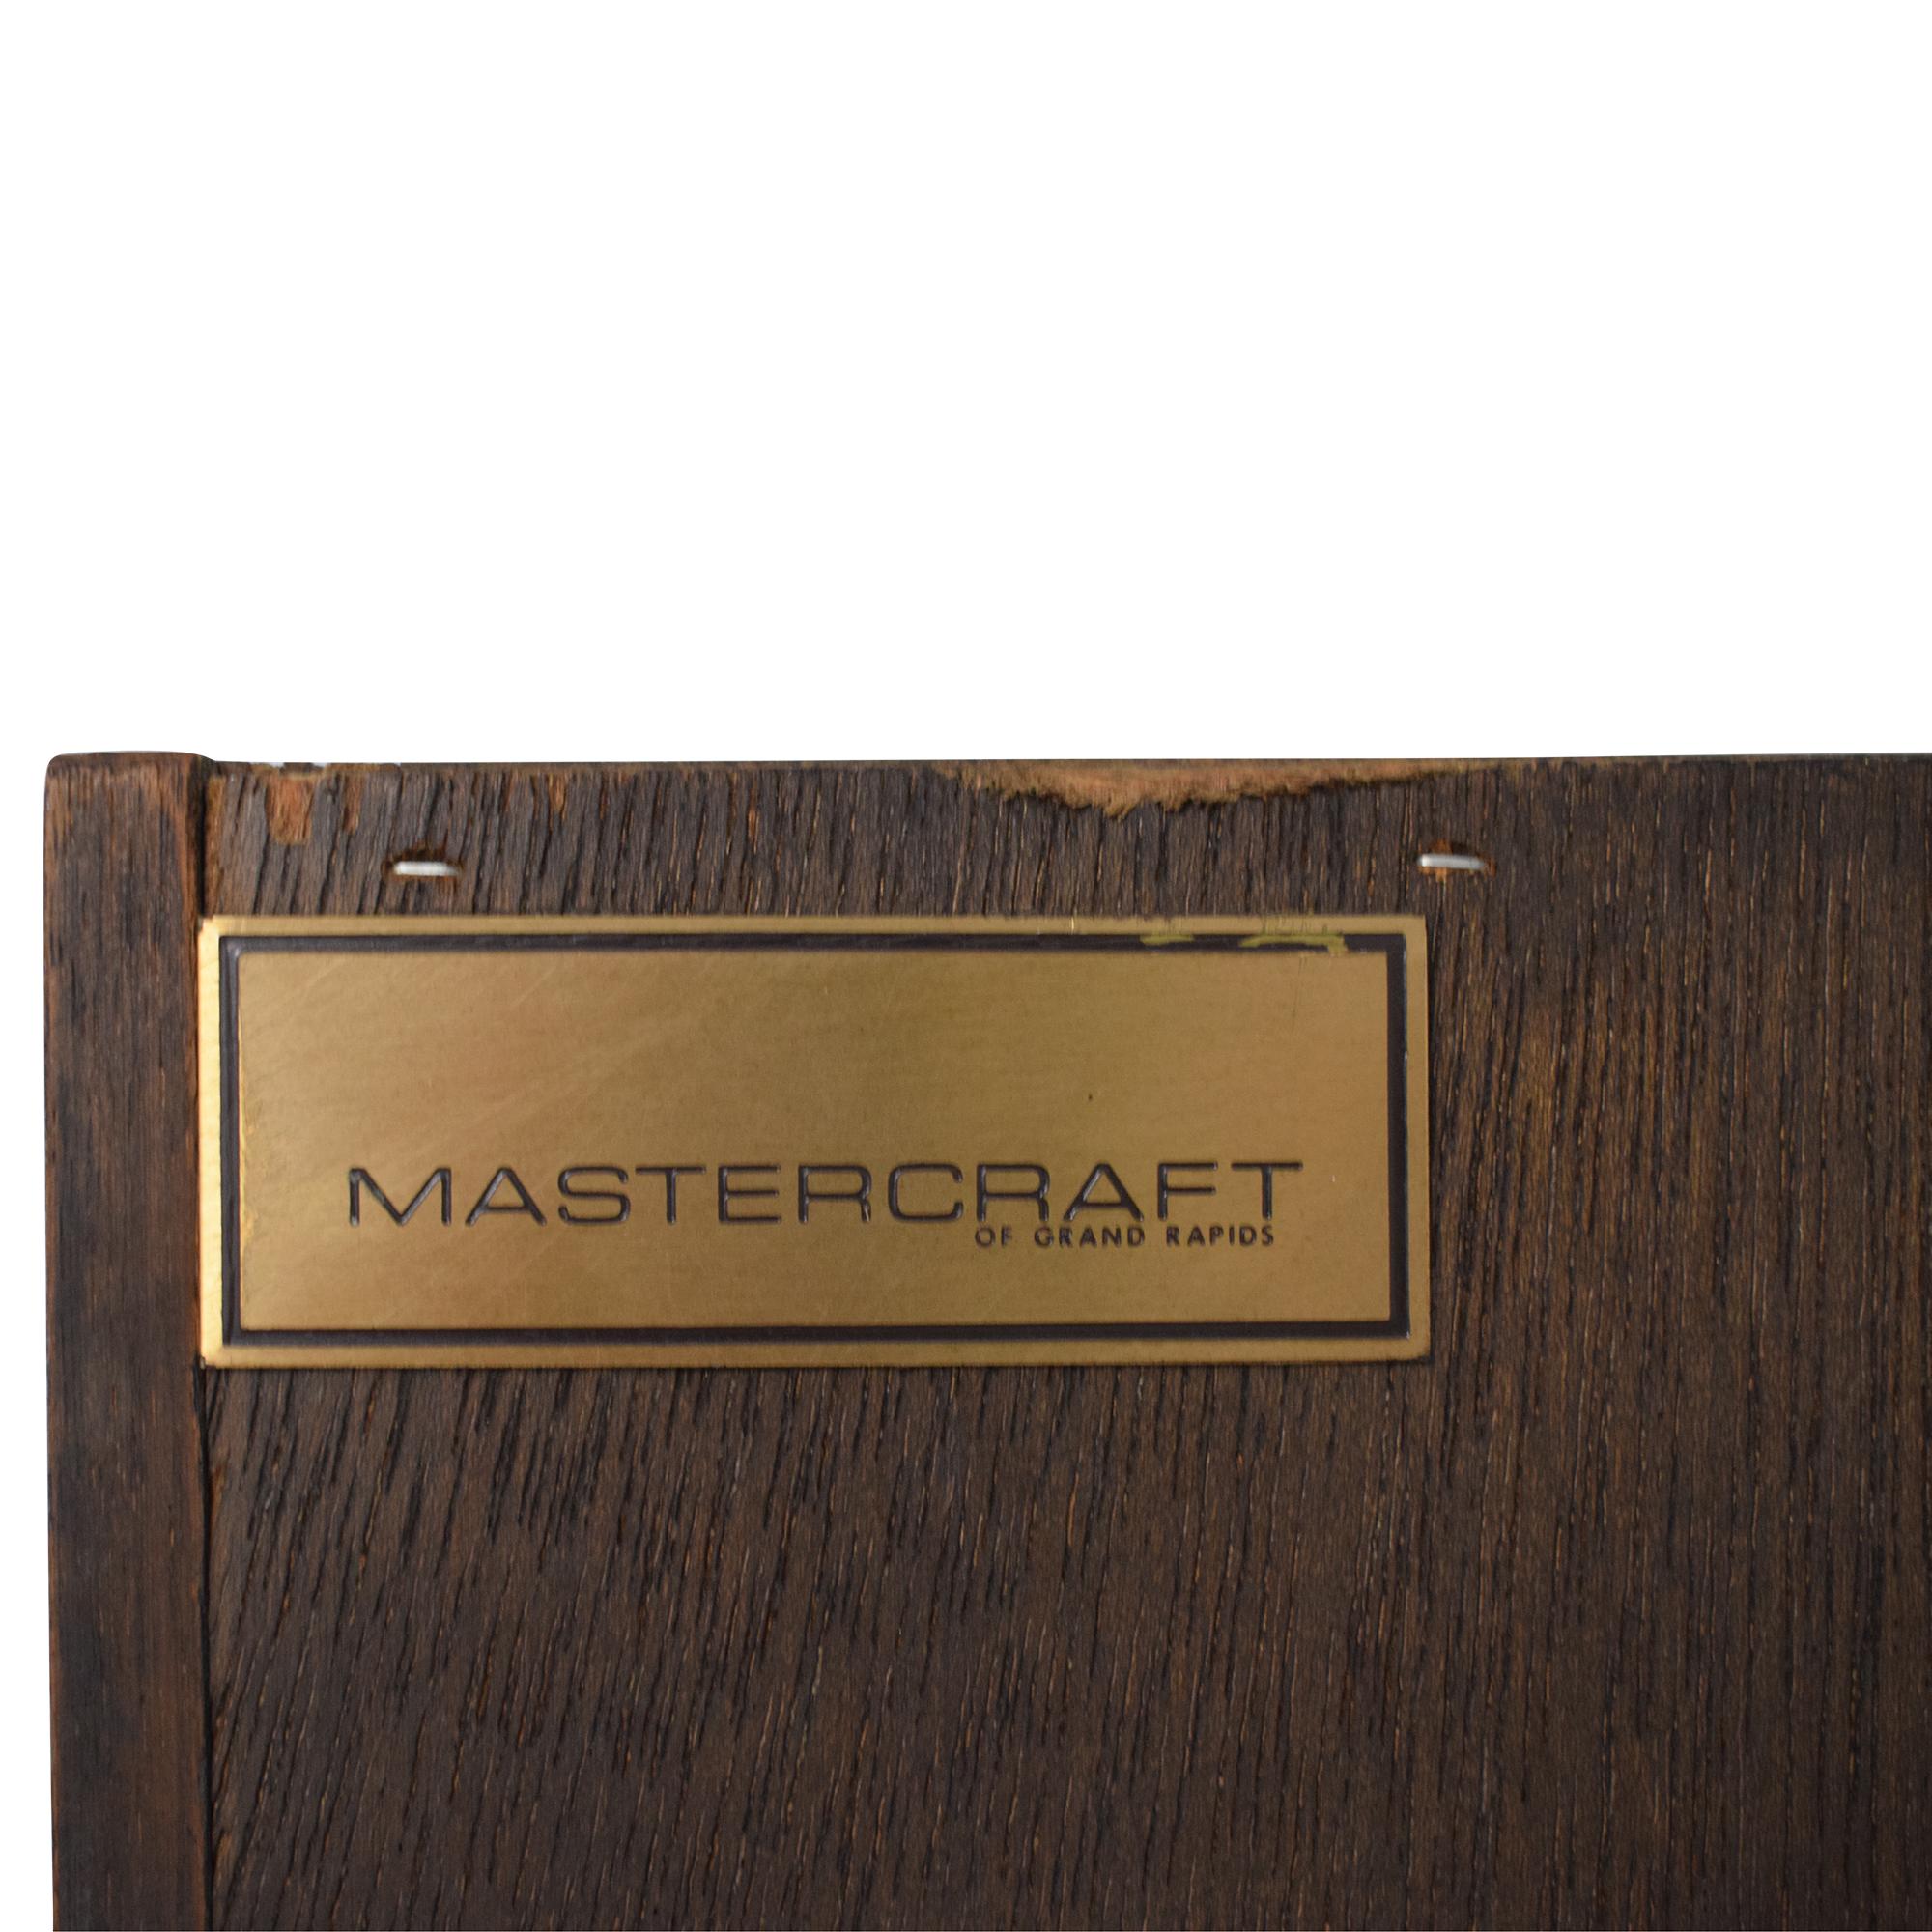 Mastercraft Furniture Mastercraft Burlwood Armoir Dresser Vintage for sale